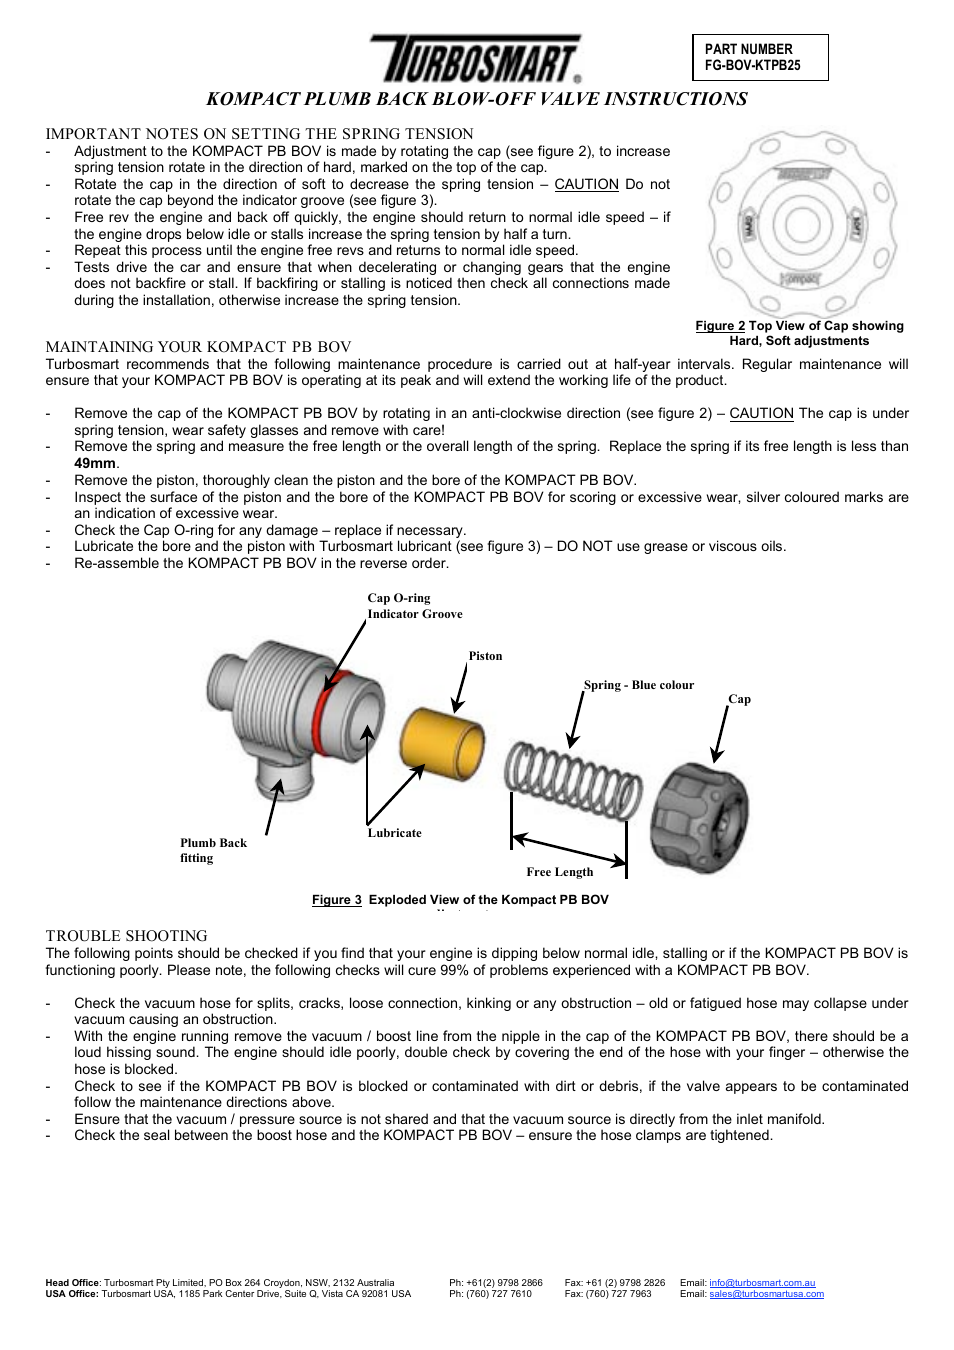 kompact plumb back blow off valve instructions turbosmart blow off rh manualsdir com back 2 life instruction manual Instruction Manual Book